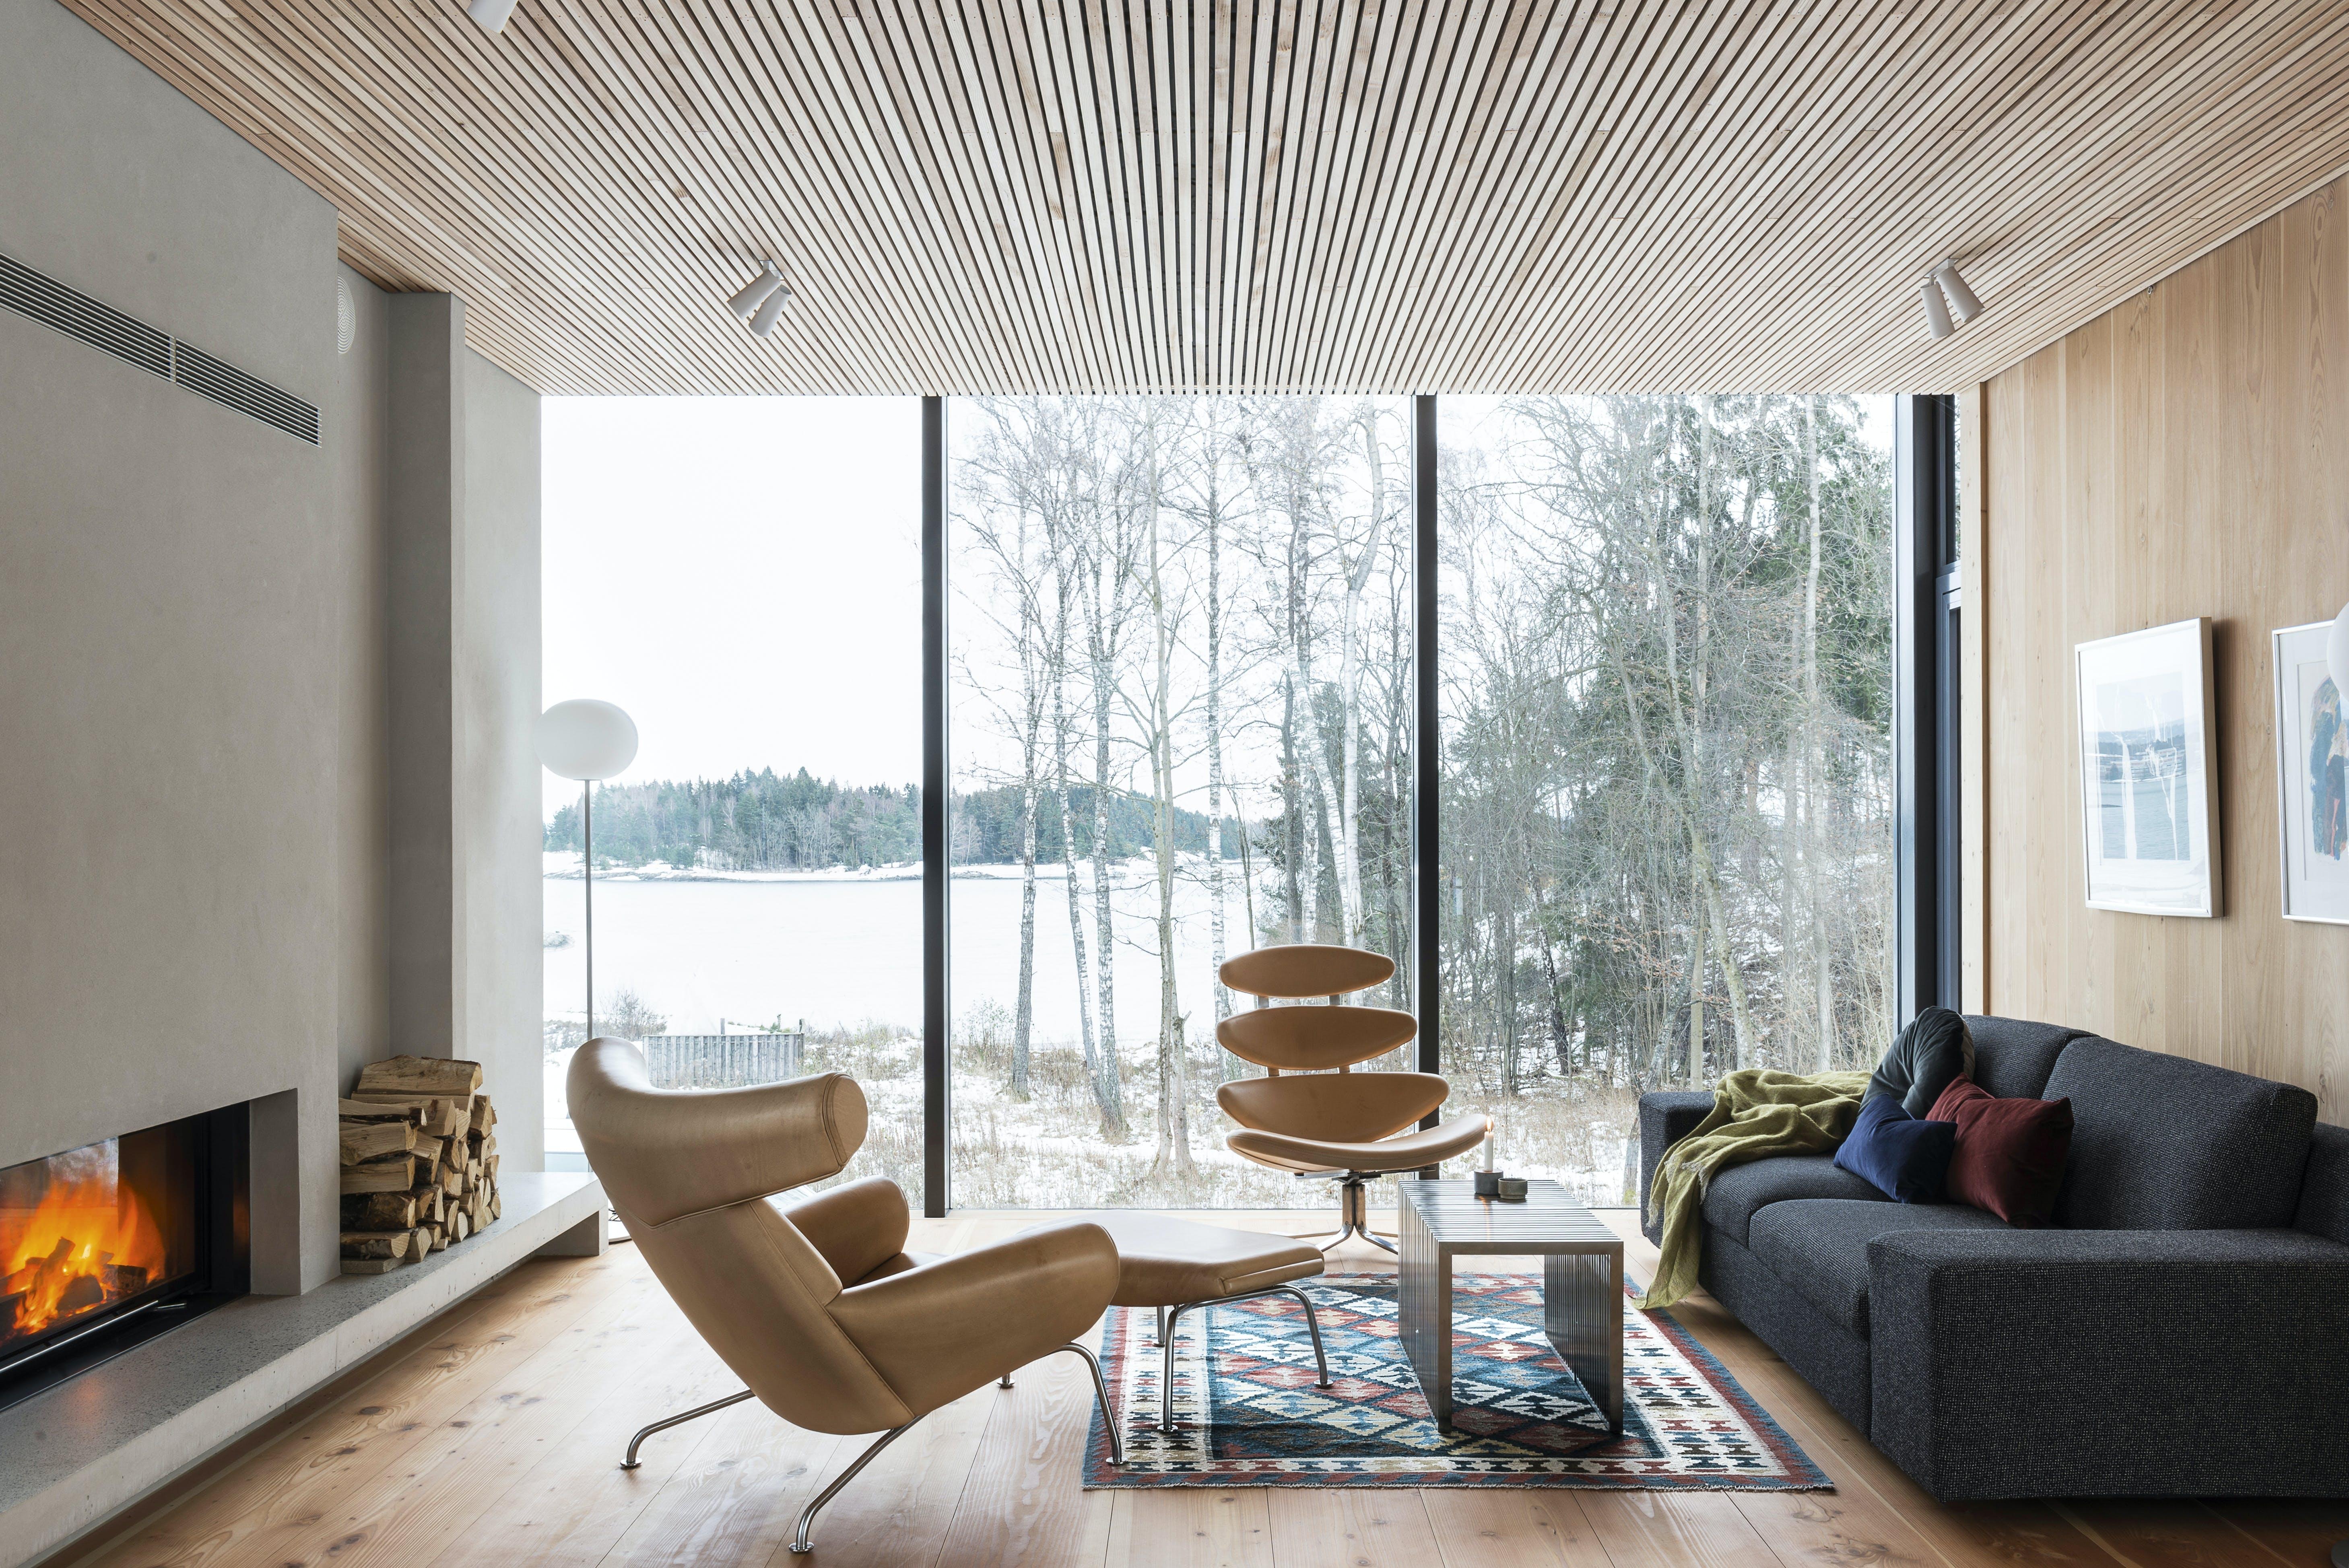 stue indretning udsigt vinduer wegner Ox Chair Volthers Coronastol Erik Jørgensen